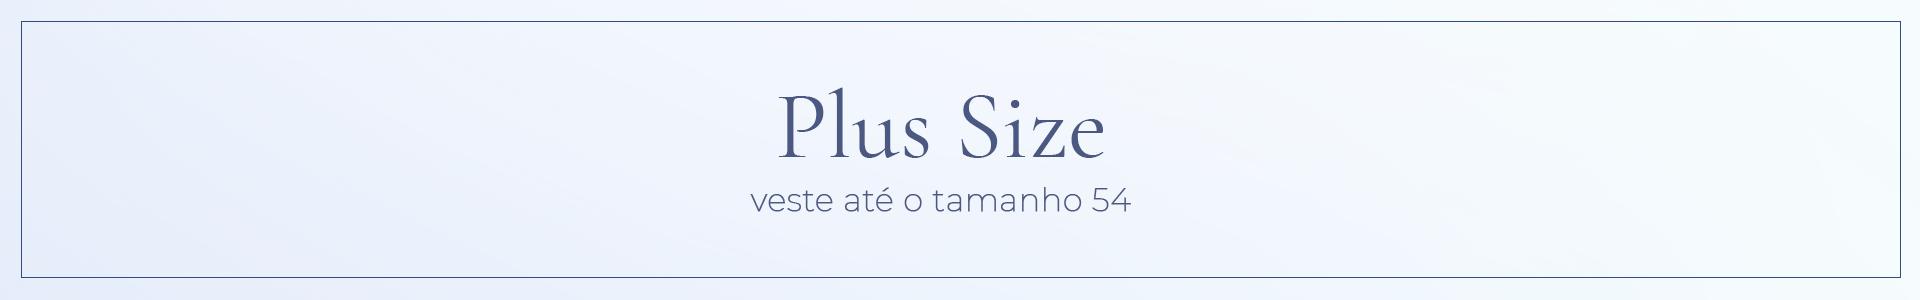 Banner Plus Size